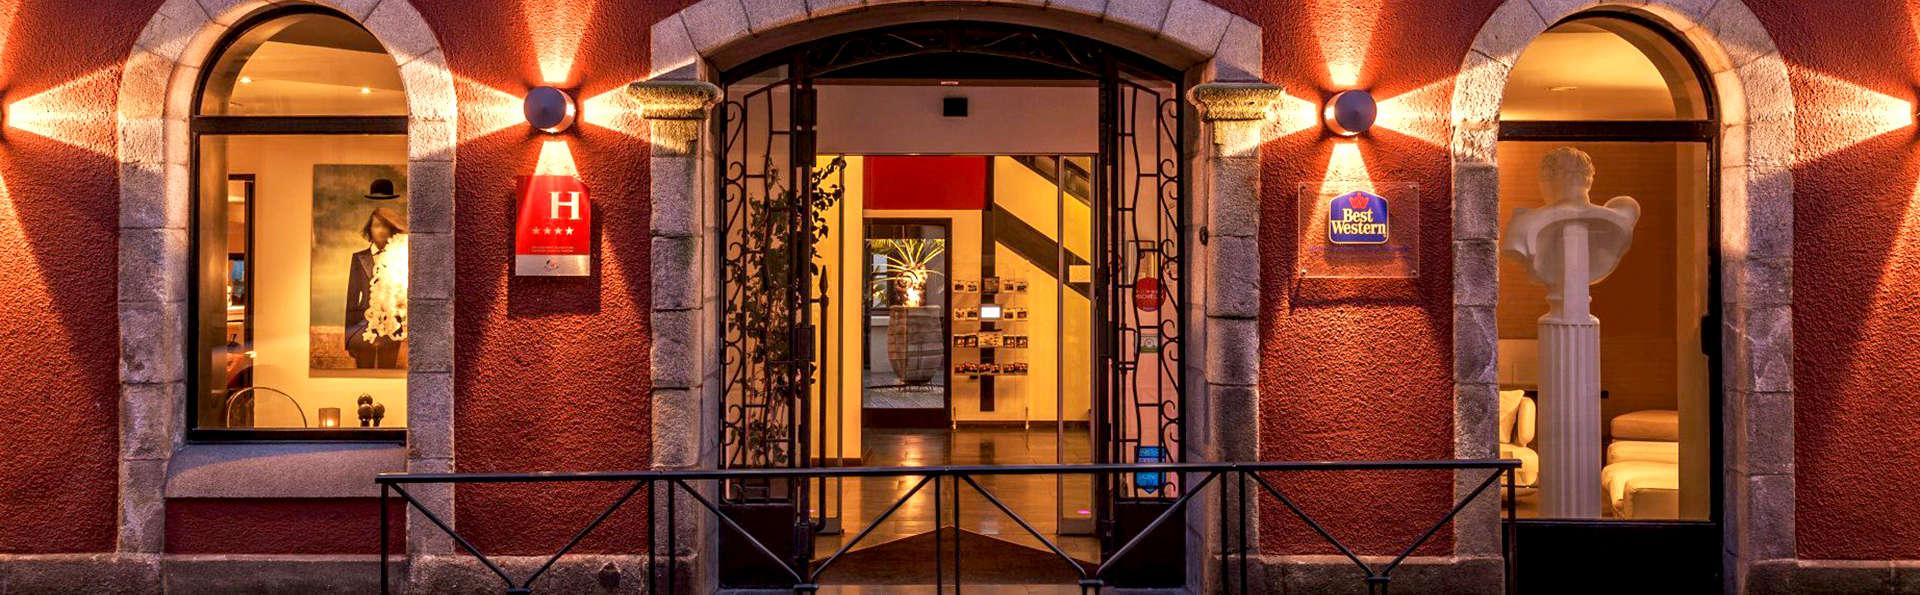 Best Western Hôtel Kregenn - Edit_Front.jpg